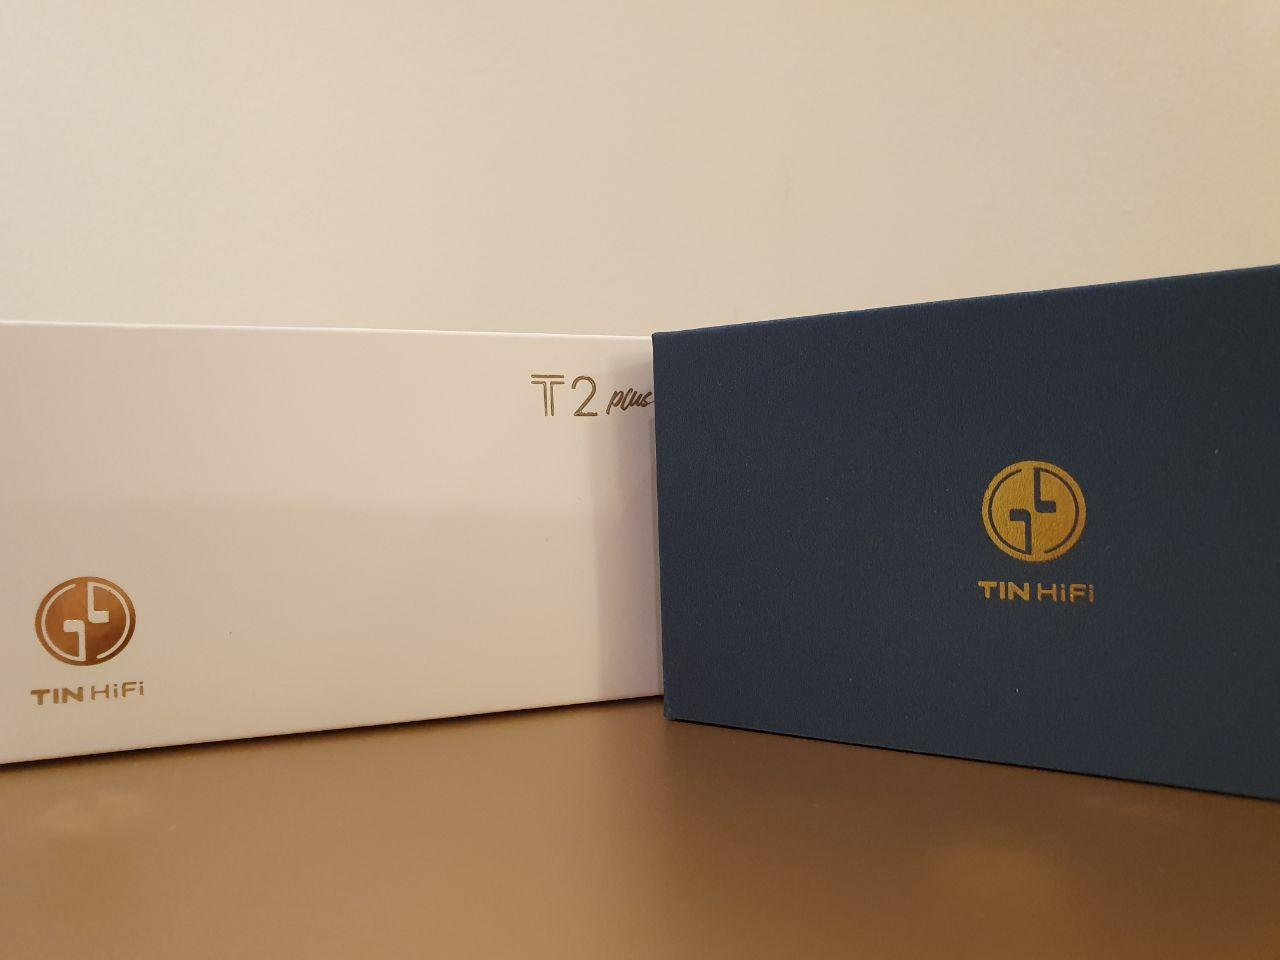 t2plusunbox2.jpg